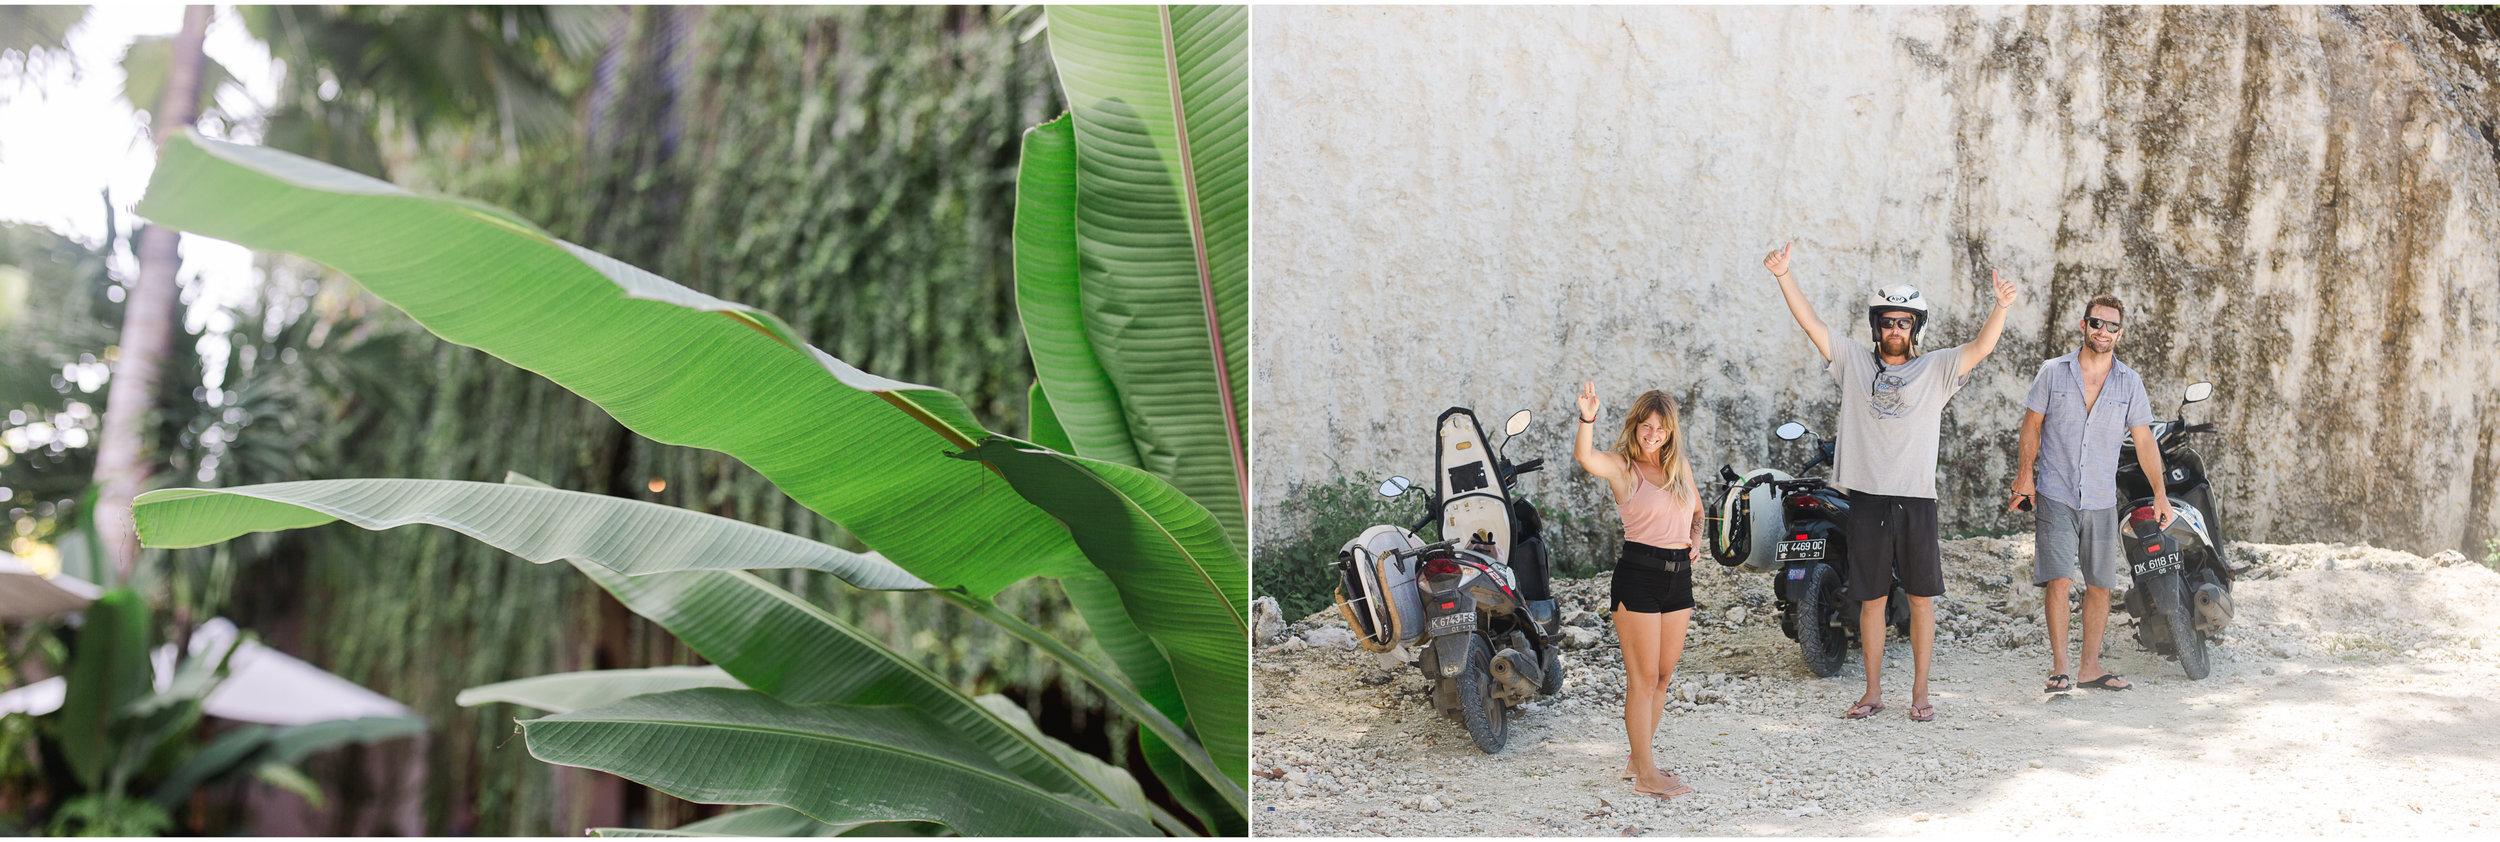 Maine Wedding Photographer Travels to Bali 37.jpg